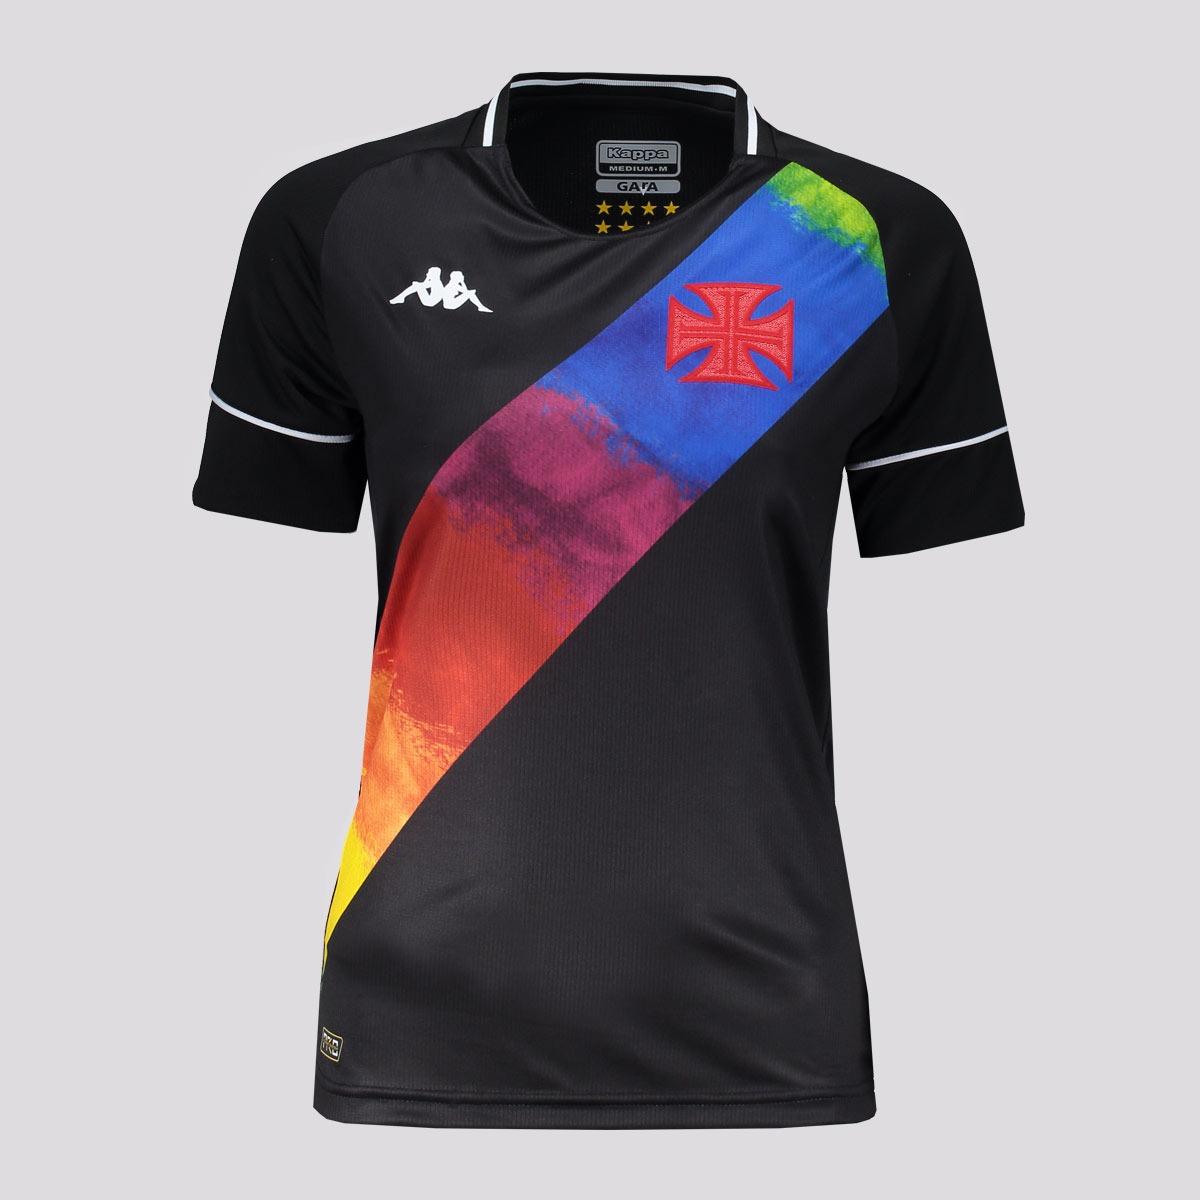 Camisa Feminina Orgulho LGBTQIA+ Preta - Kappa